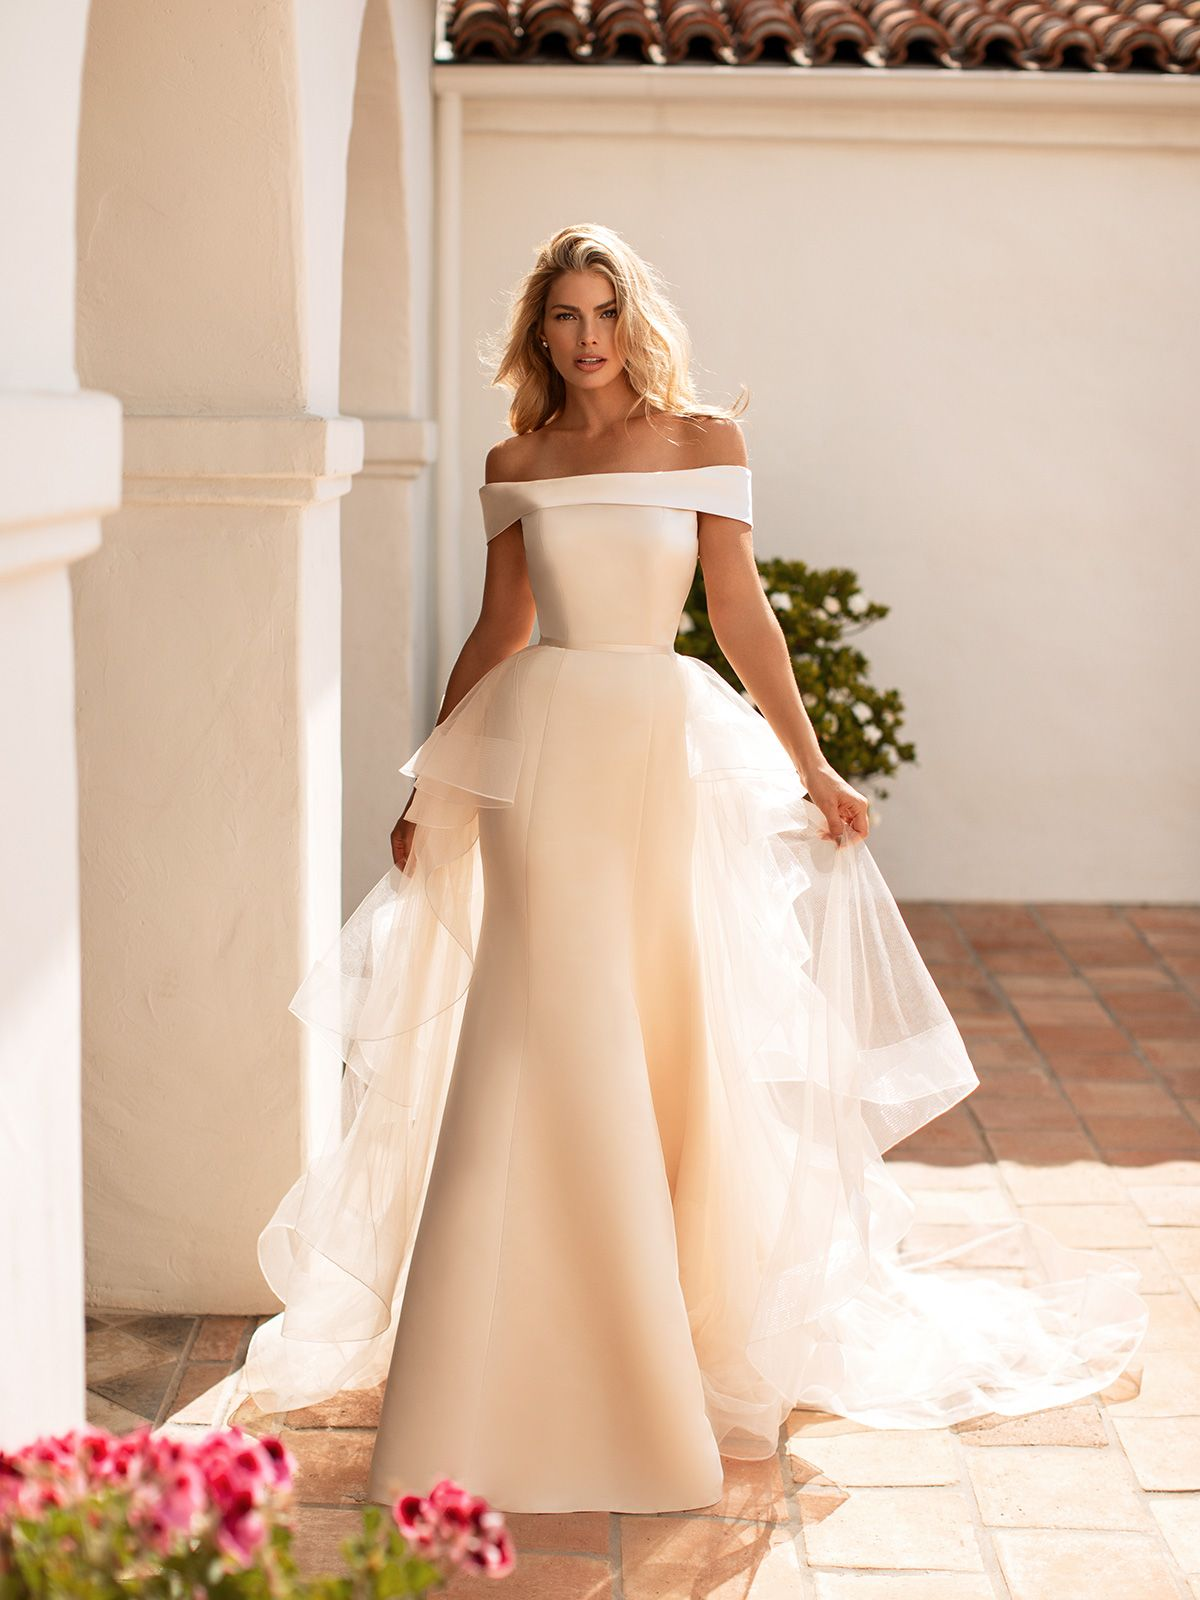 Convertible Satin Fold Over Mermaid Wedding Dress Moonlight Collection J6771 Satin Mermaid Wedding Dress Detachable Train Wedding Dress Boho Wedding Dress [ 1600 x 1200 Pixel ]